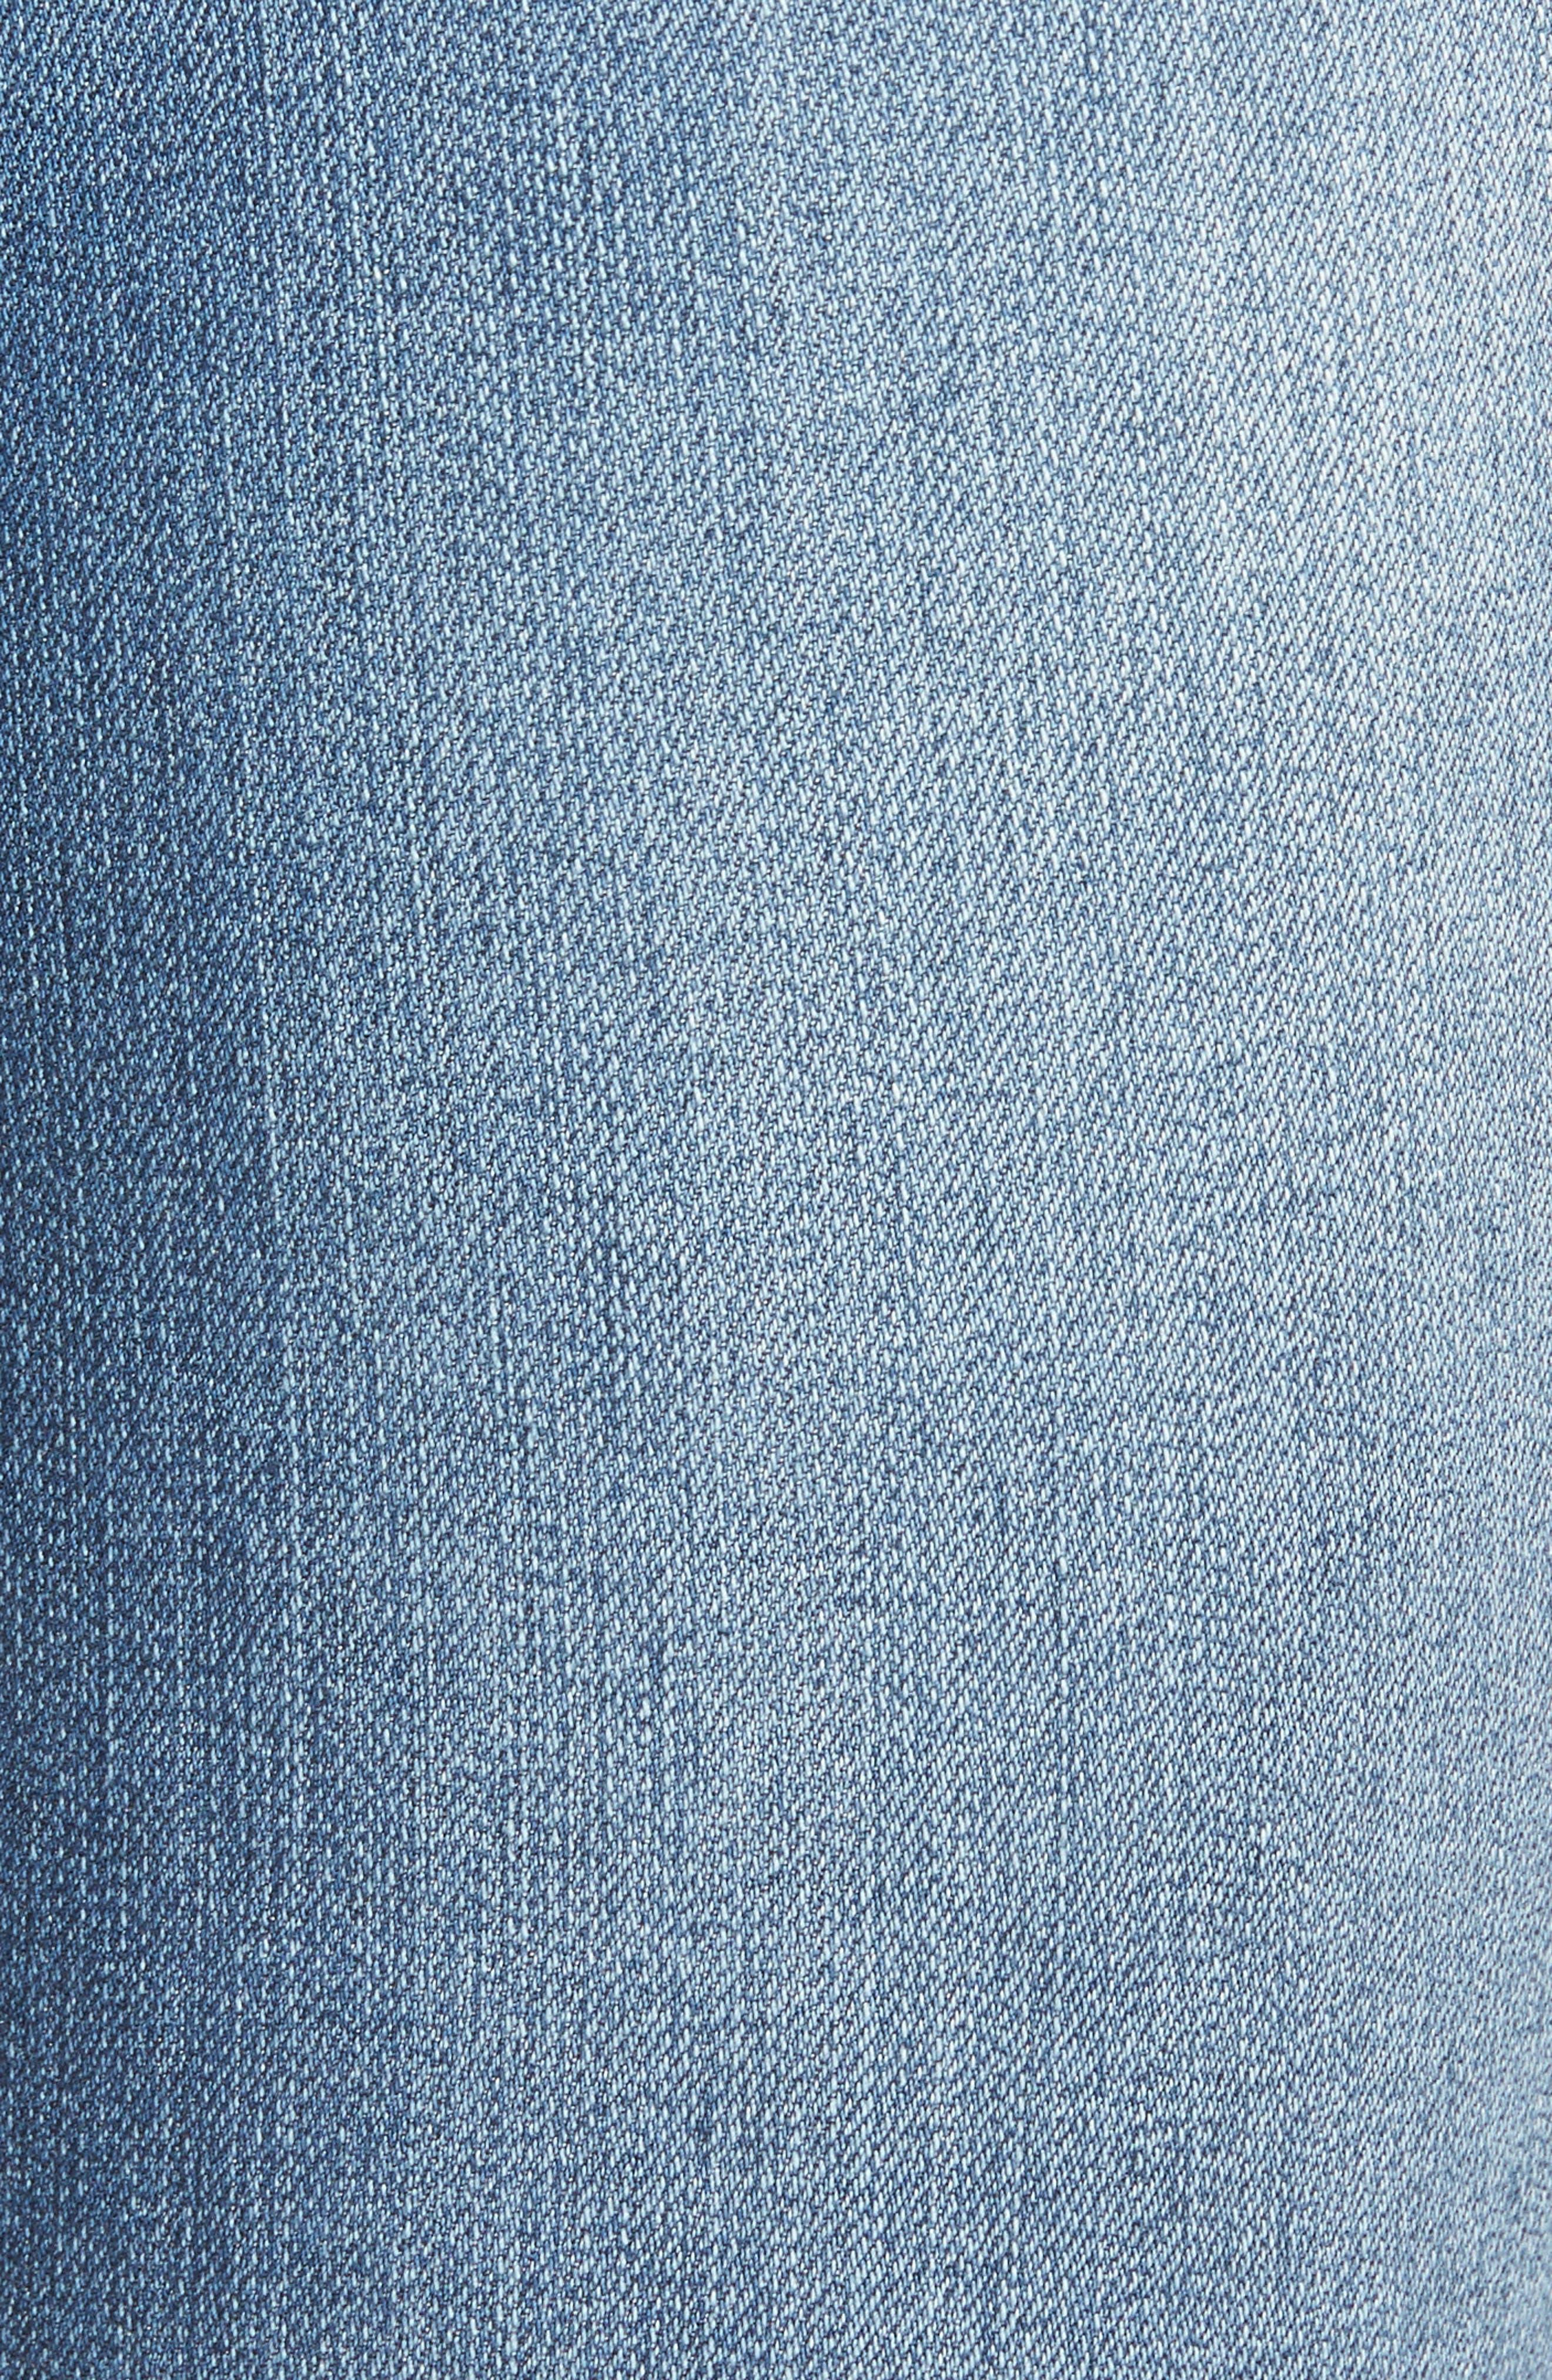 Alternate Image 5  - 1822 Denim Step Hem Skinny Jeans (Greg)